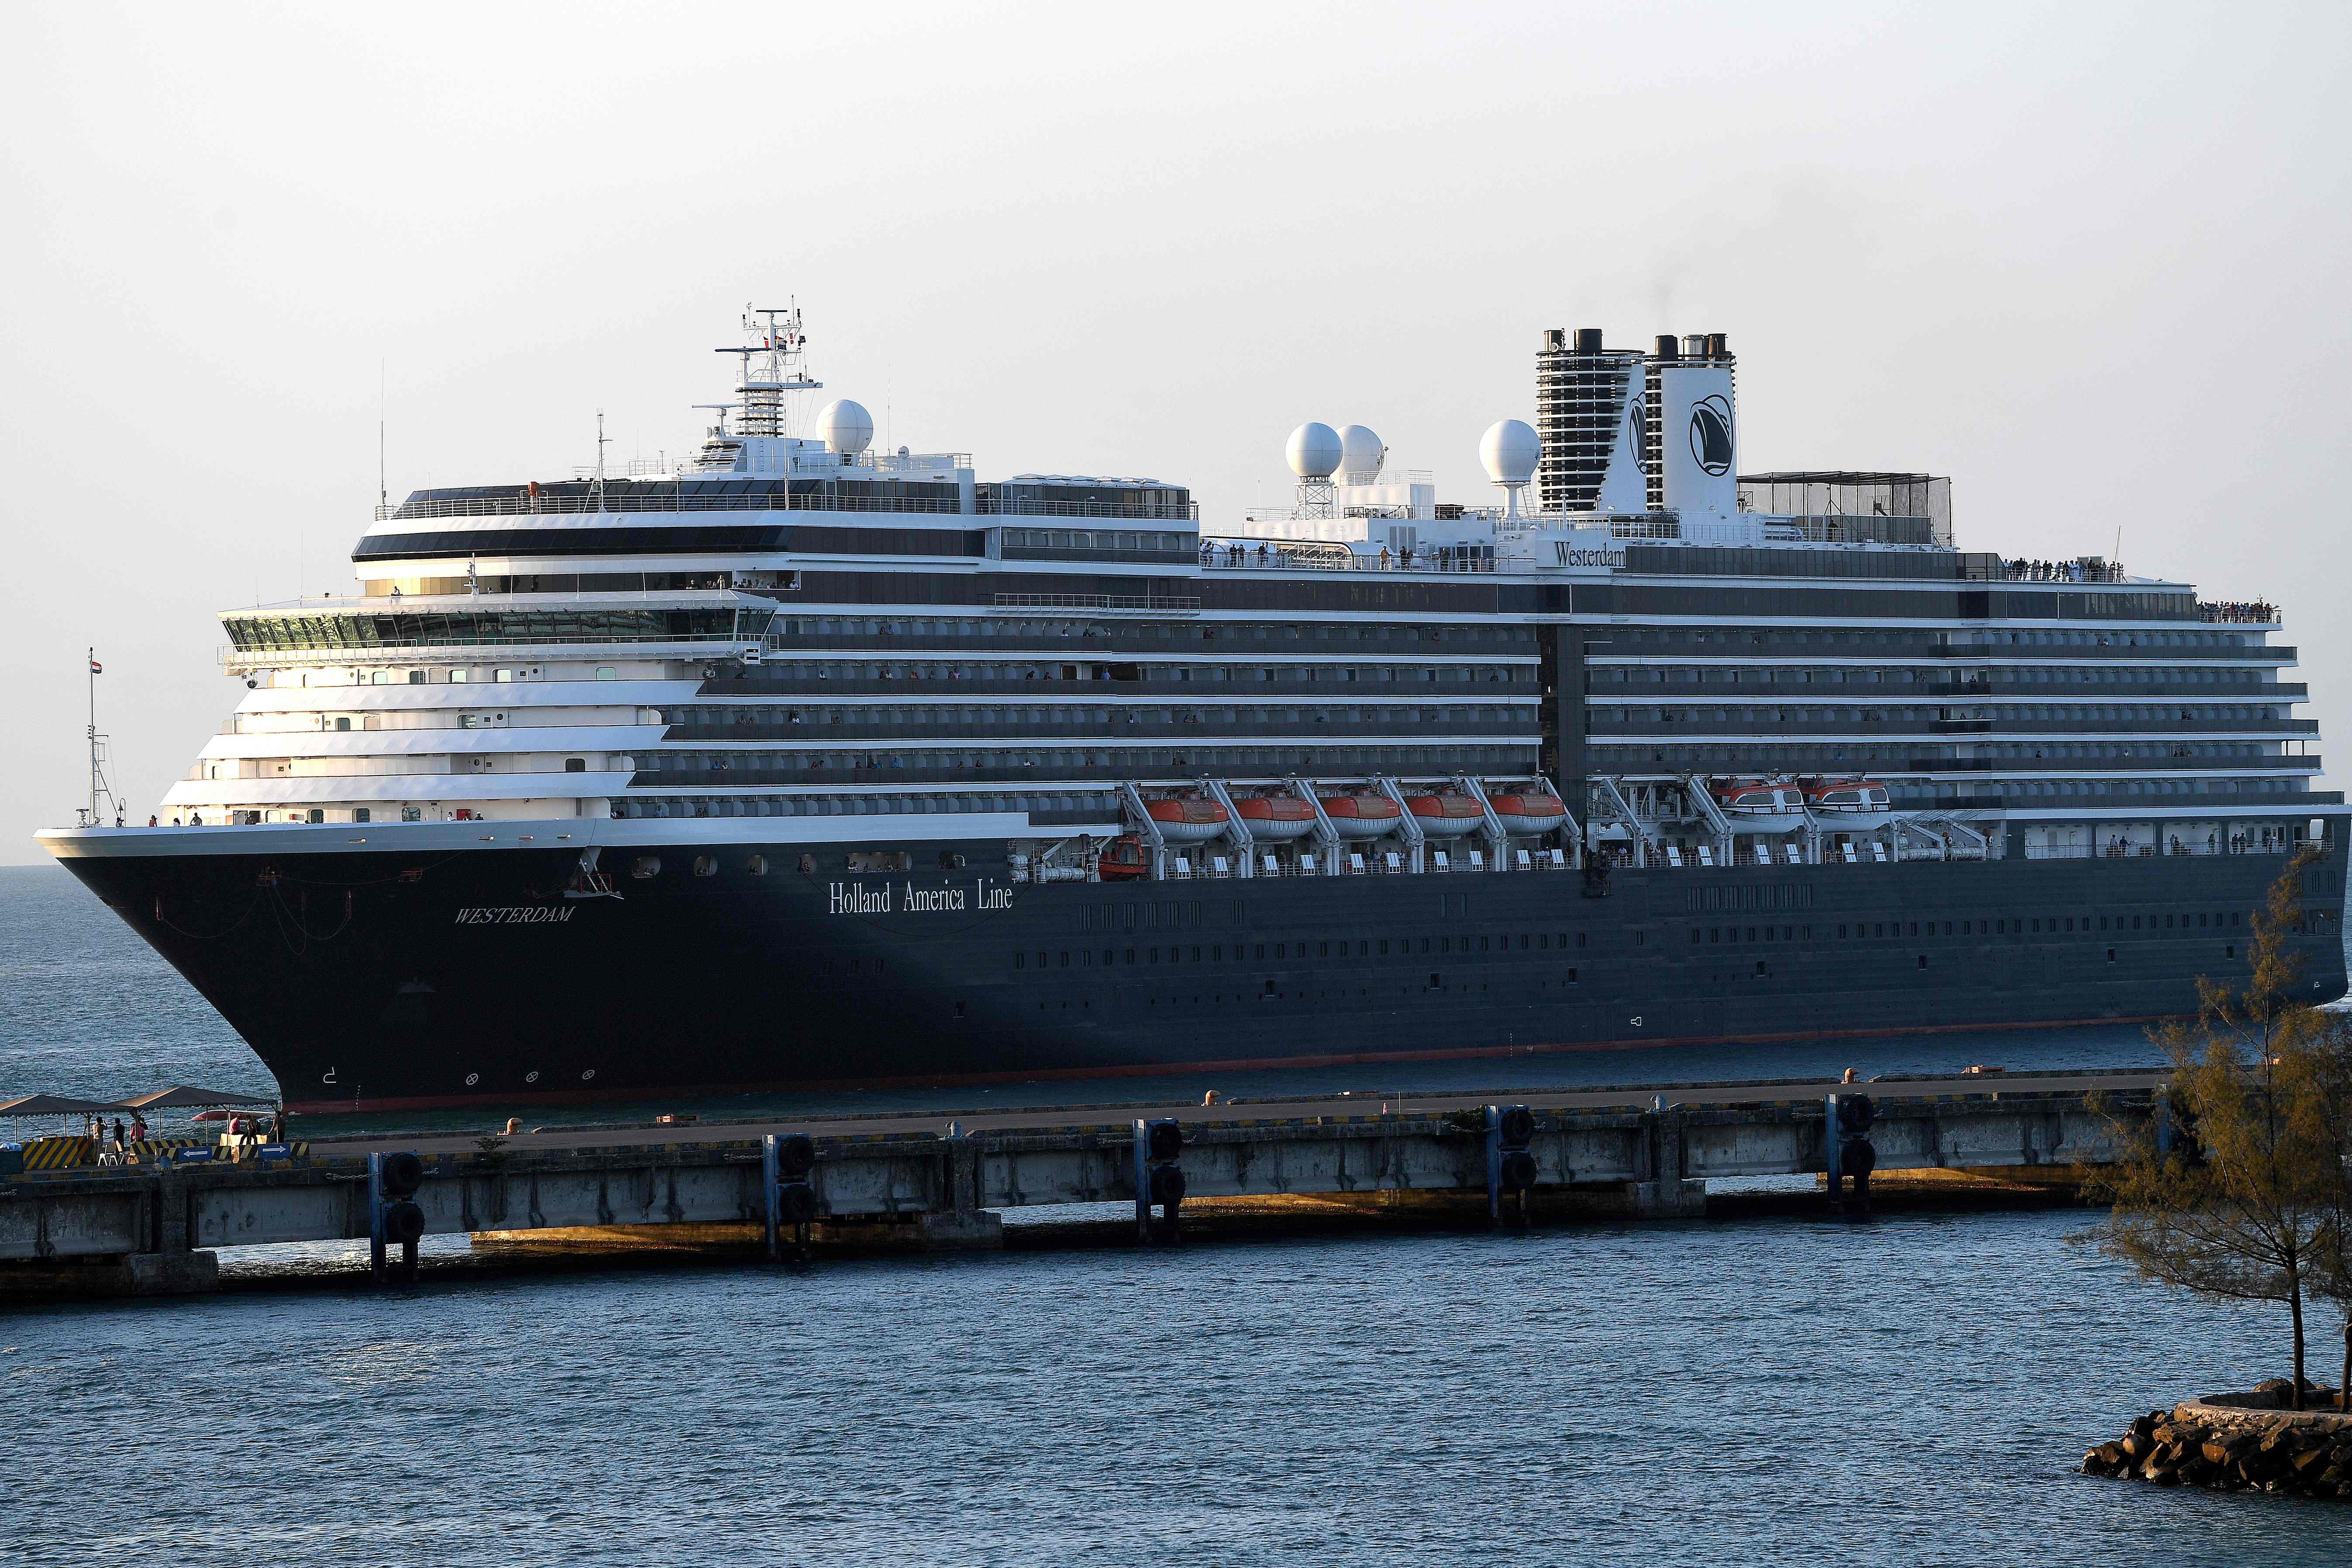 Holland America cruise ship passengers disembark in Cambodia after coronavirus limbo